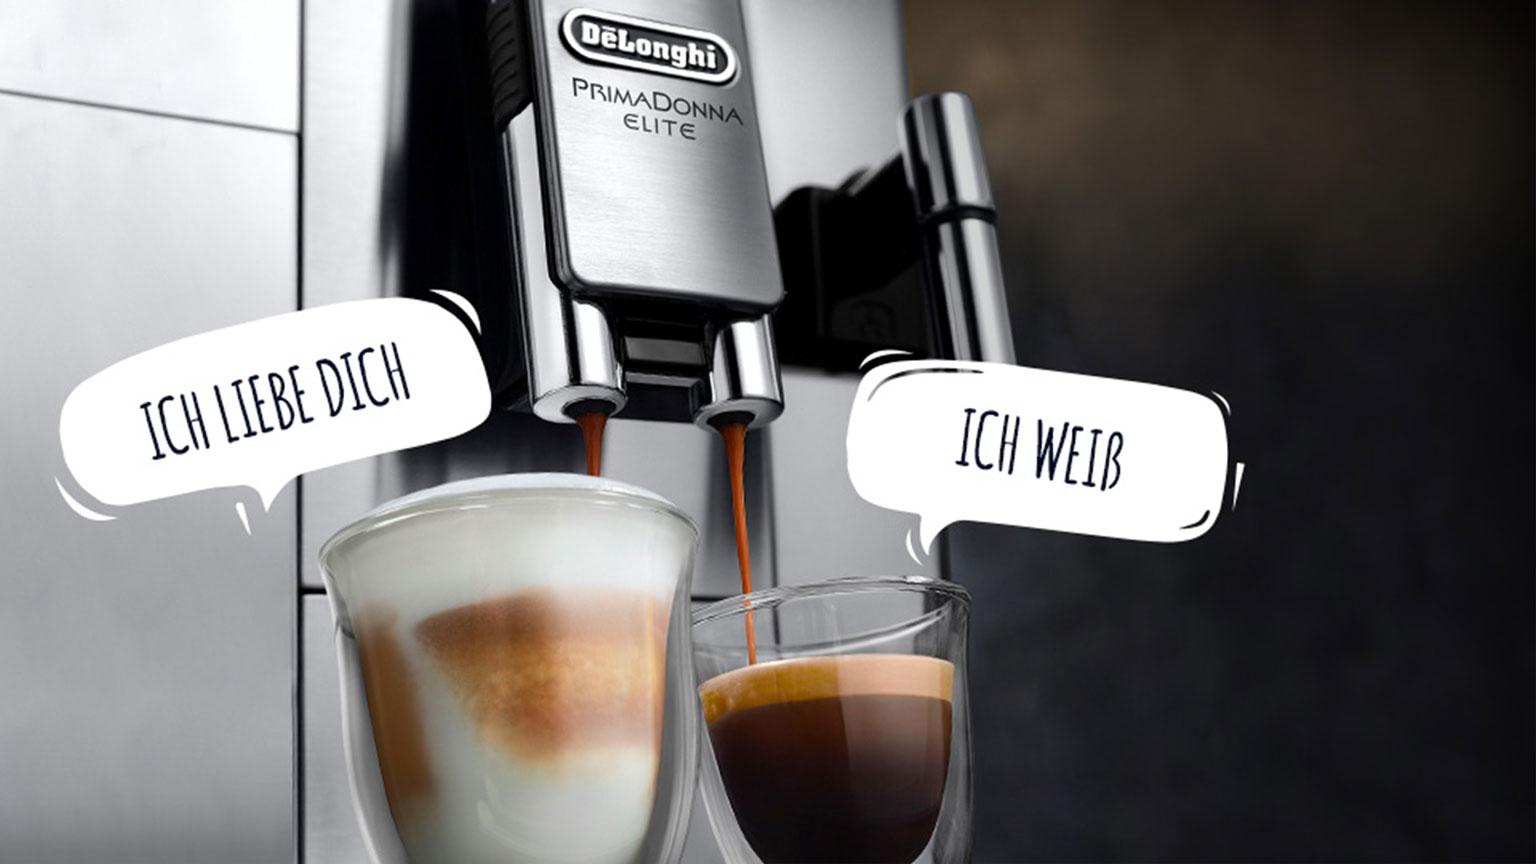 De'Longhi Social Media Facebook-Betreuung dietz posting kaffee